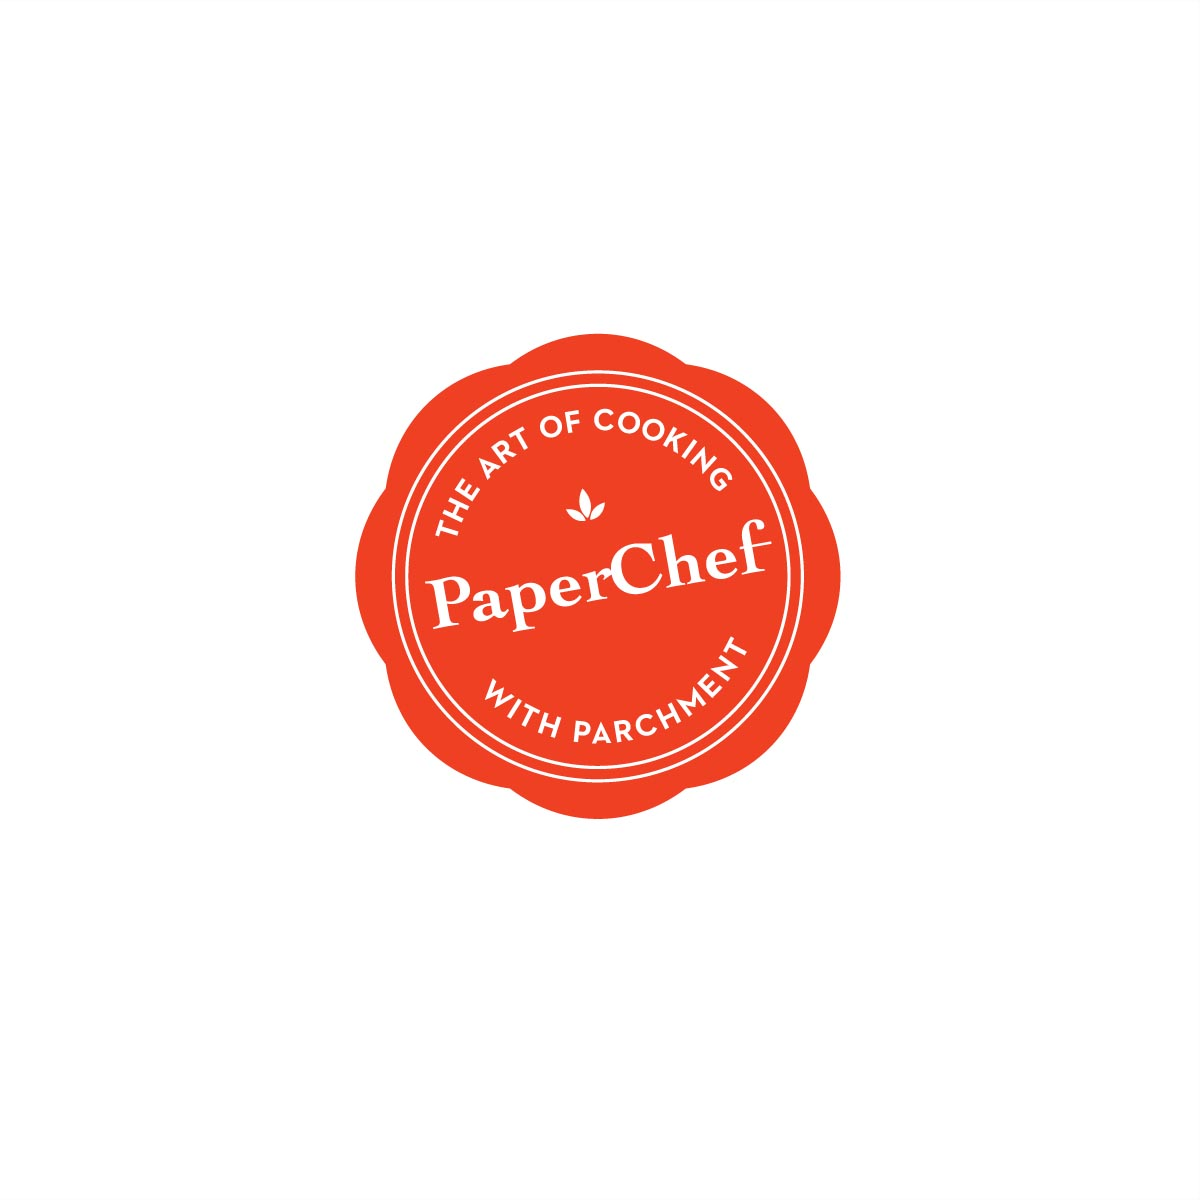 PaperChef_01.jpg